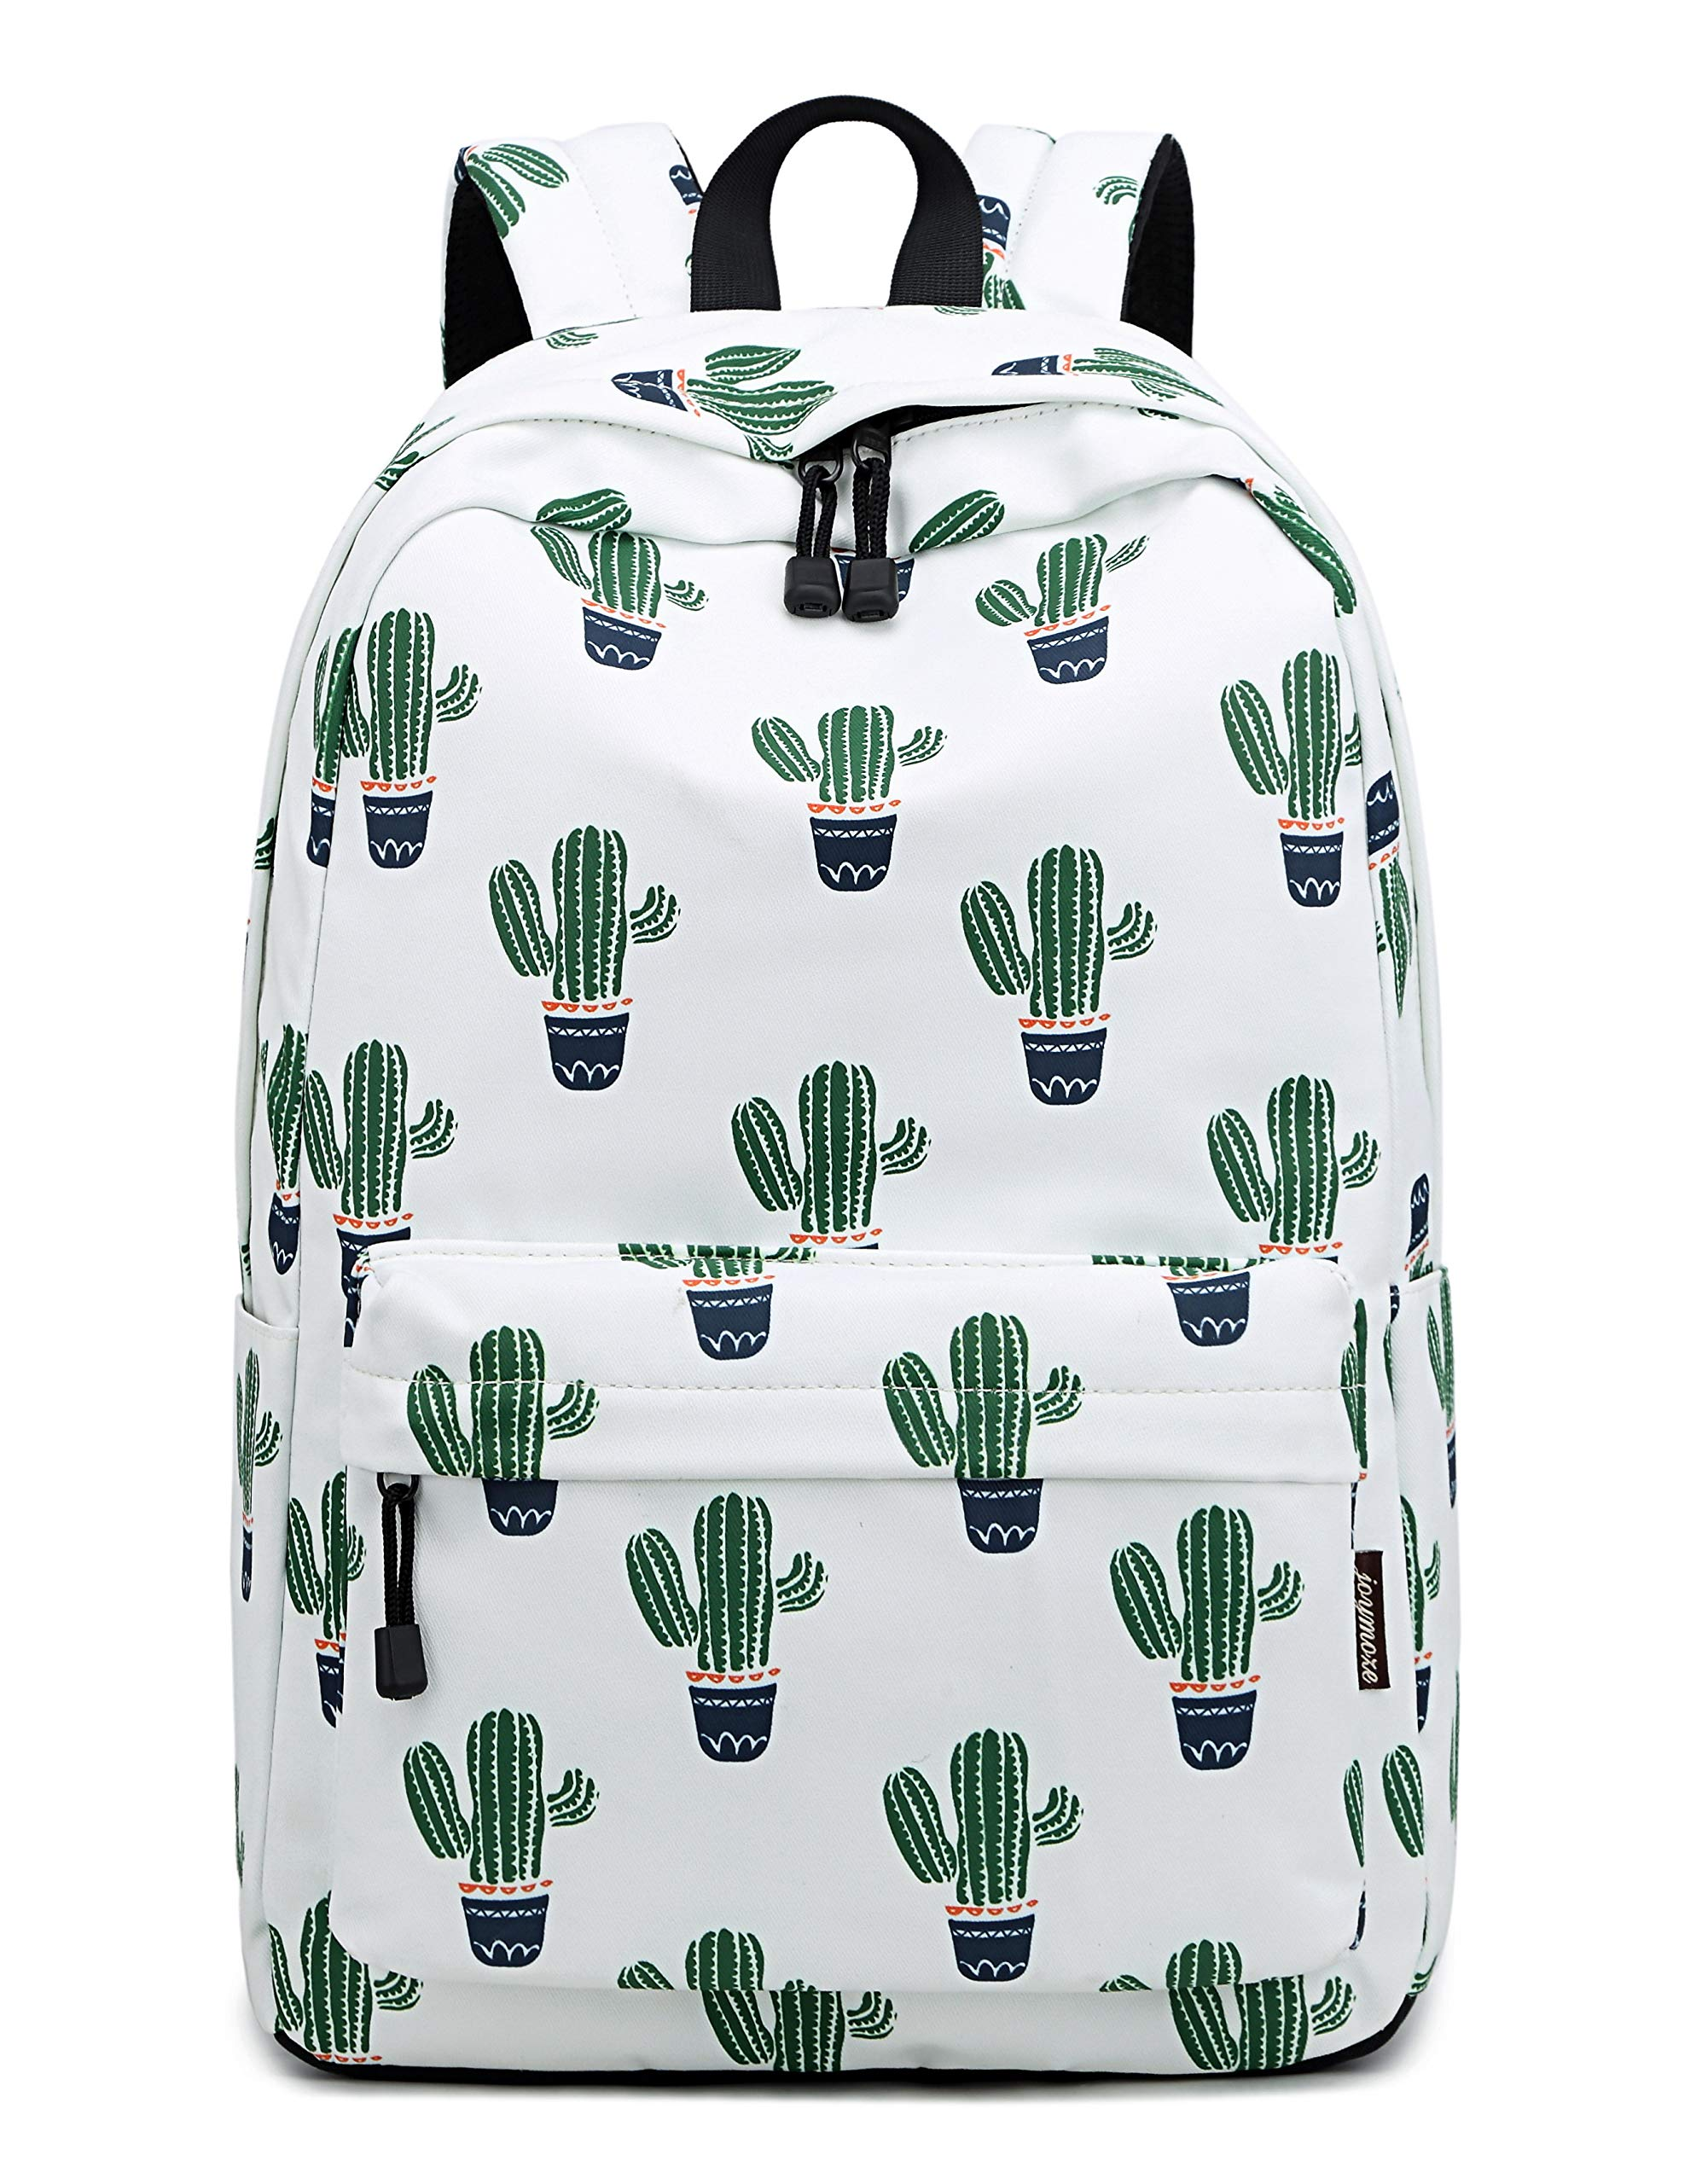 Teecho Girls Waterproof School Backpack Fashion 15.6'' Laptop Backpack for Teenager Green Cactus by Teecho